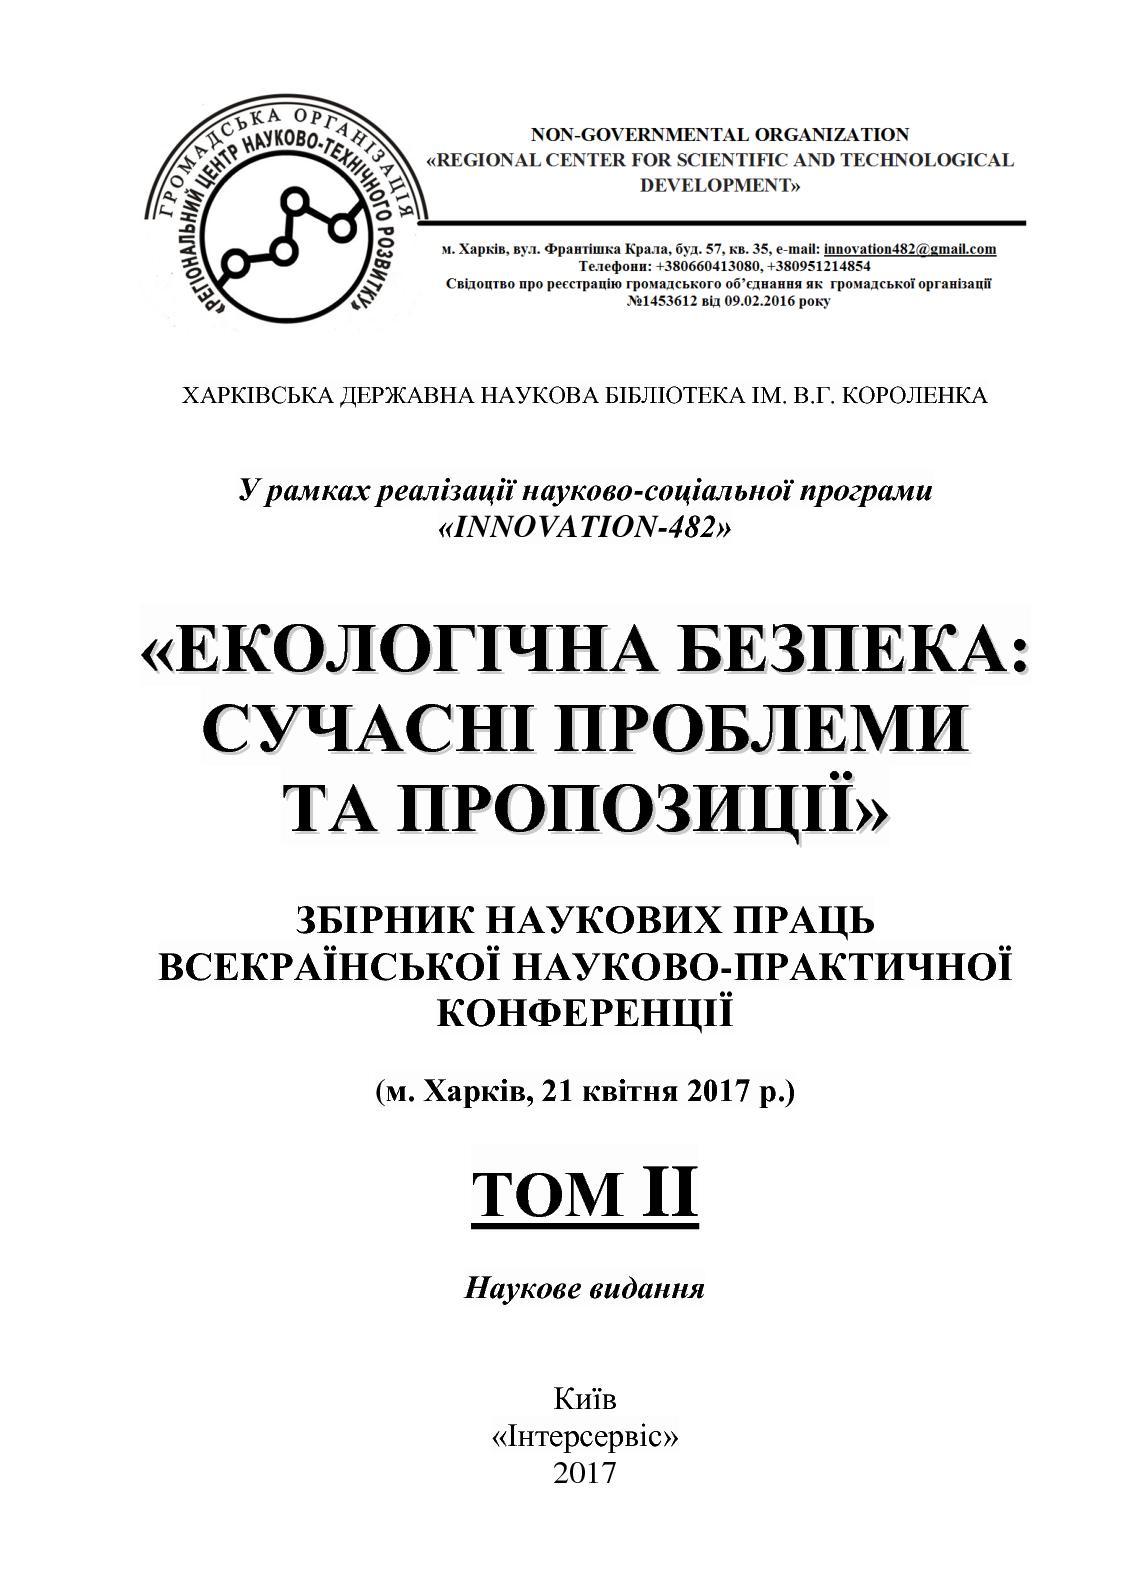 Наказ мнестерства топлива та енегретики вд 30 травня 2003 року 264